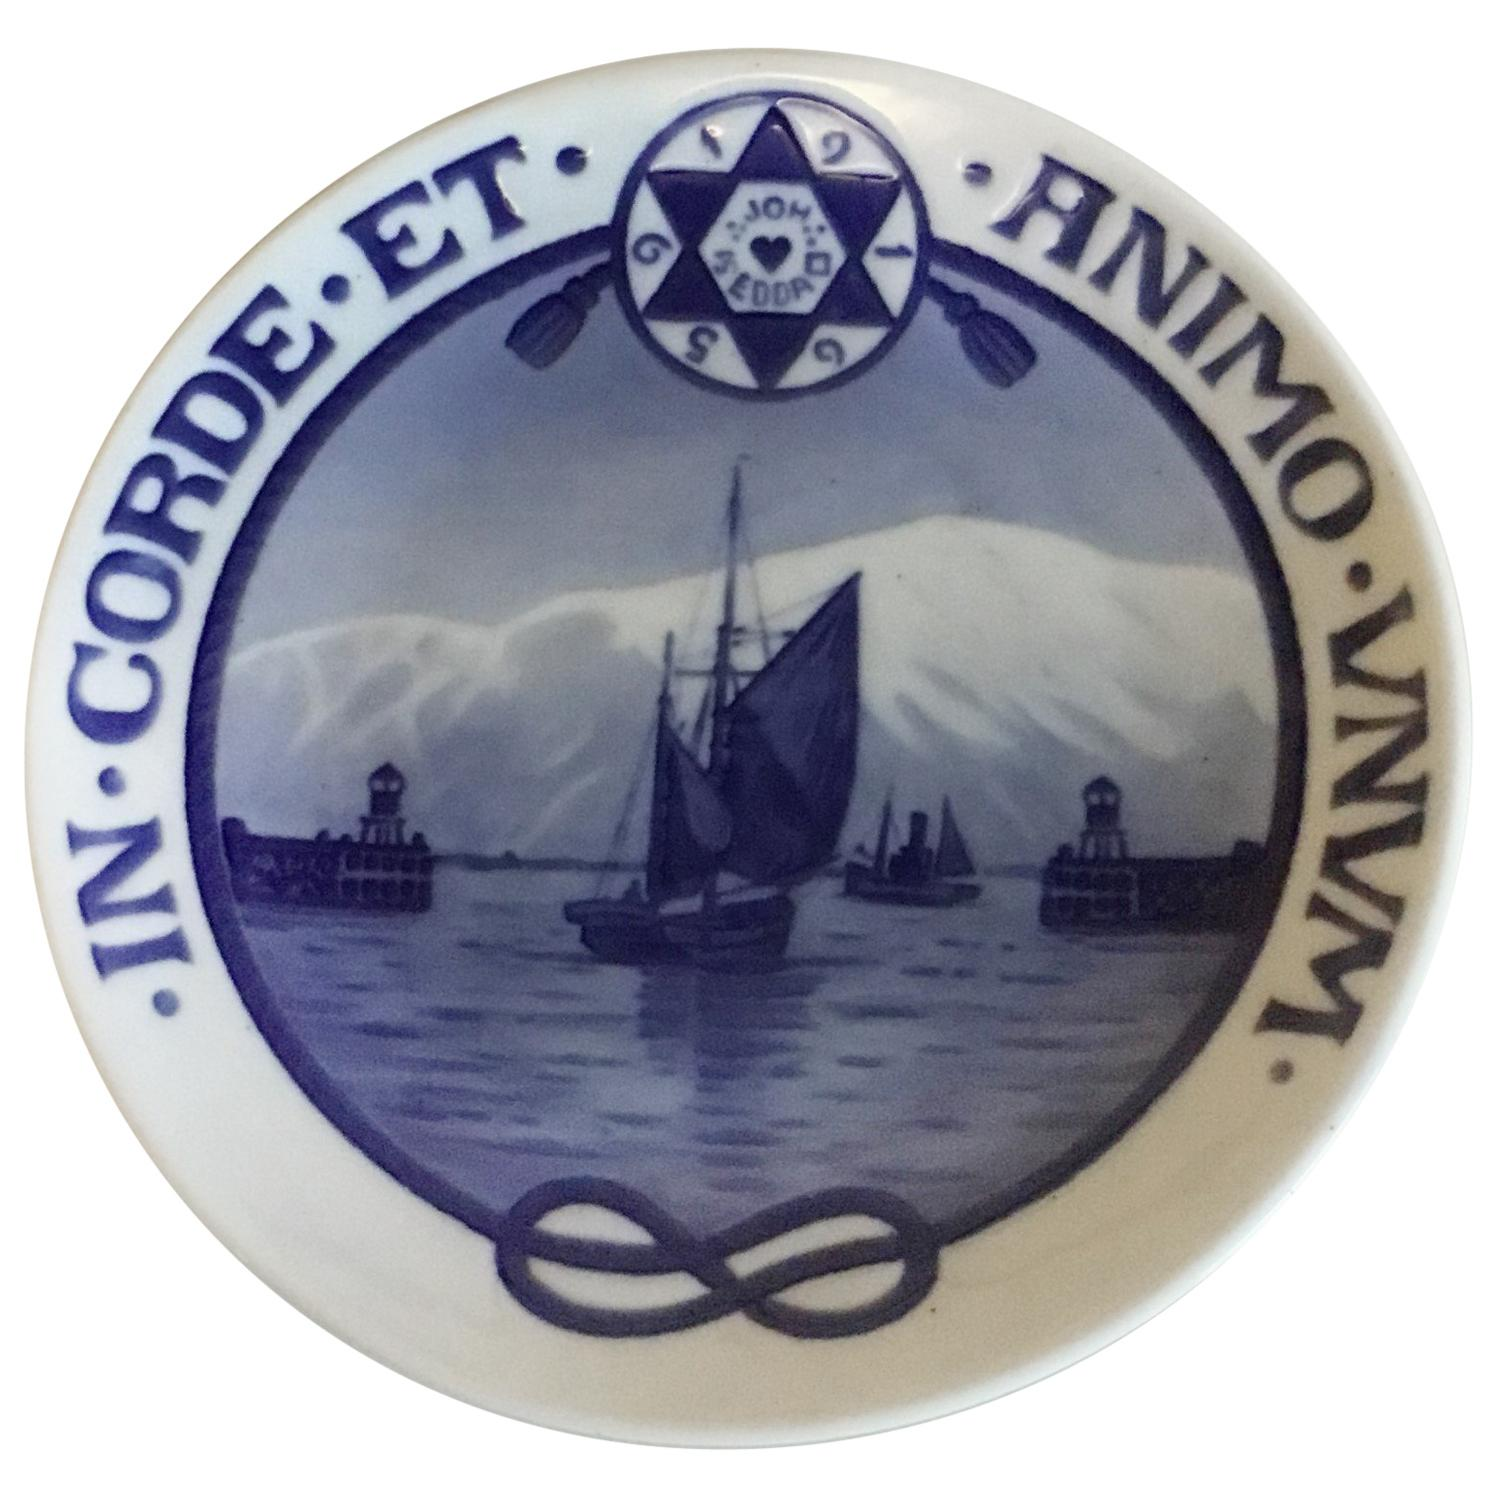 Royal Copenhagen Commemorative Plate from 1922 RC-CM207